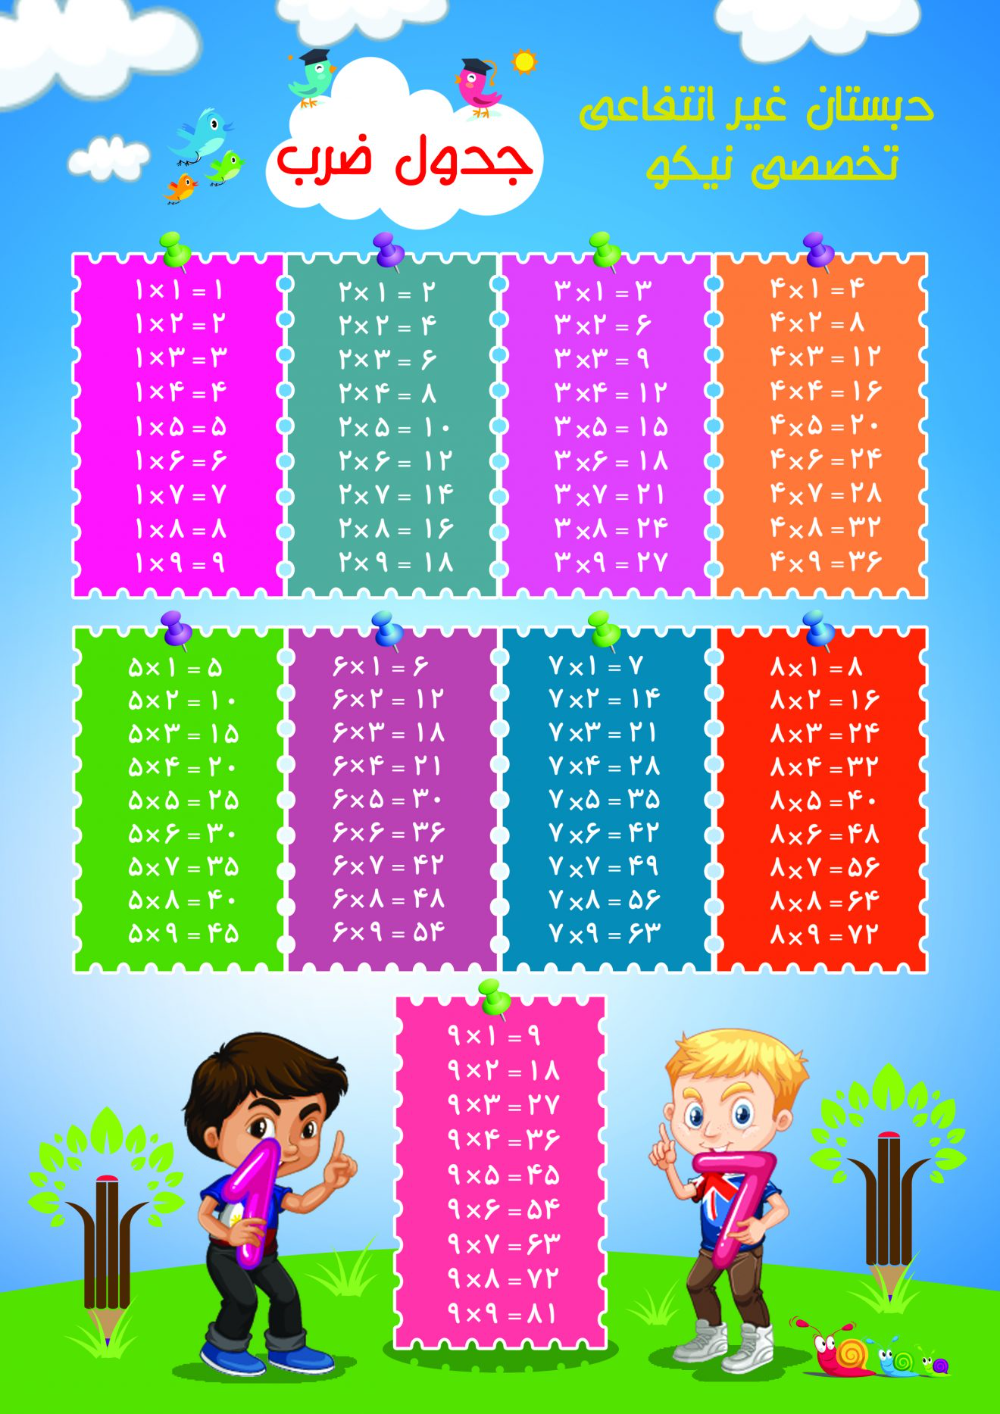 تراکت جدول ضرب تراکت جدول ضرب مهد کودک و پیش دبستانی بنر مهد کودک طرح تراکت مهد کودک بنر مهد کودک کار Mario Characters Character Fictional Characters